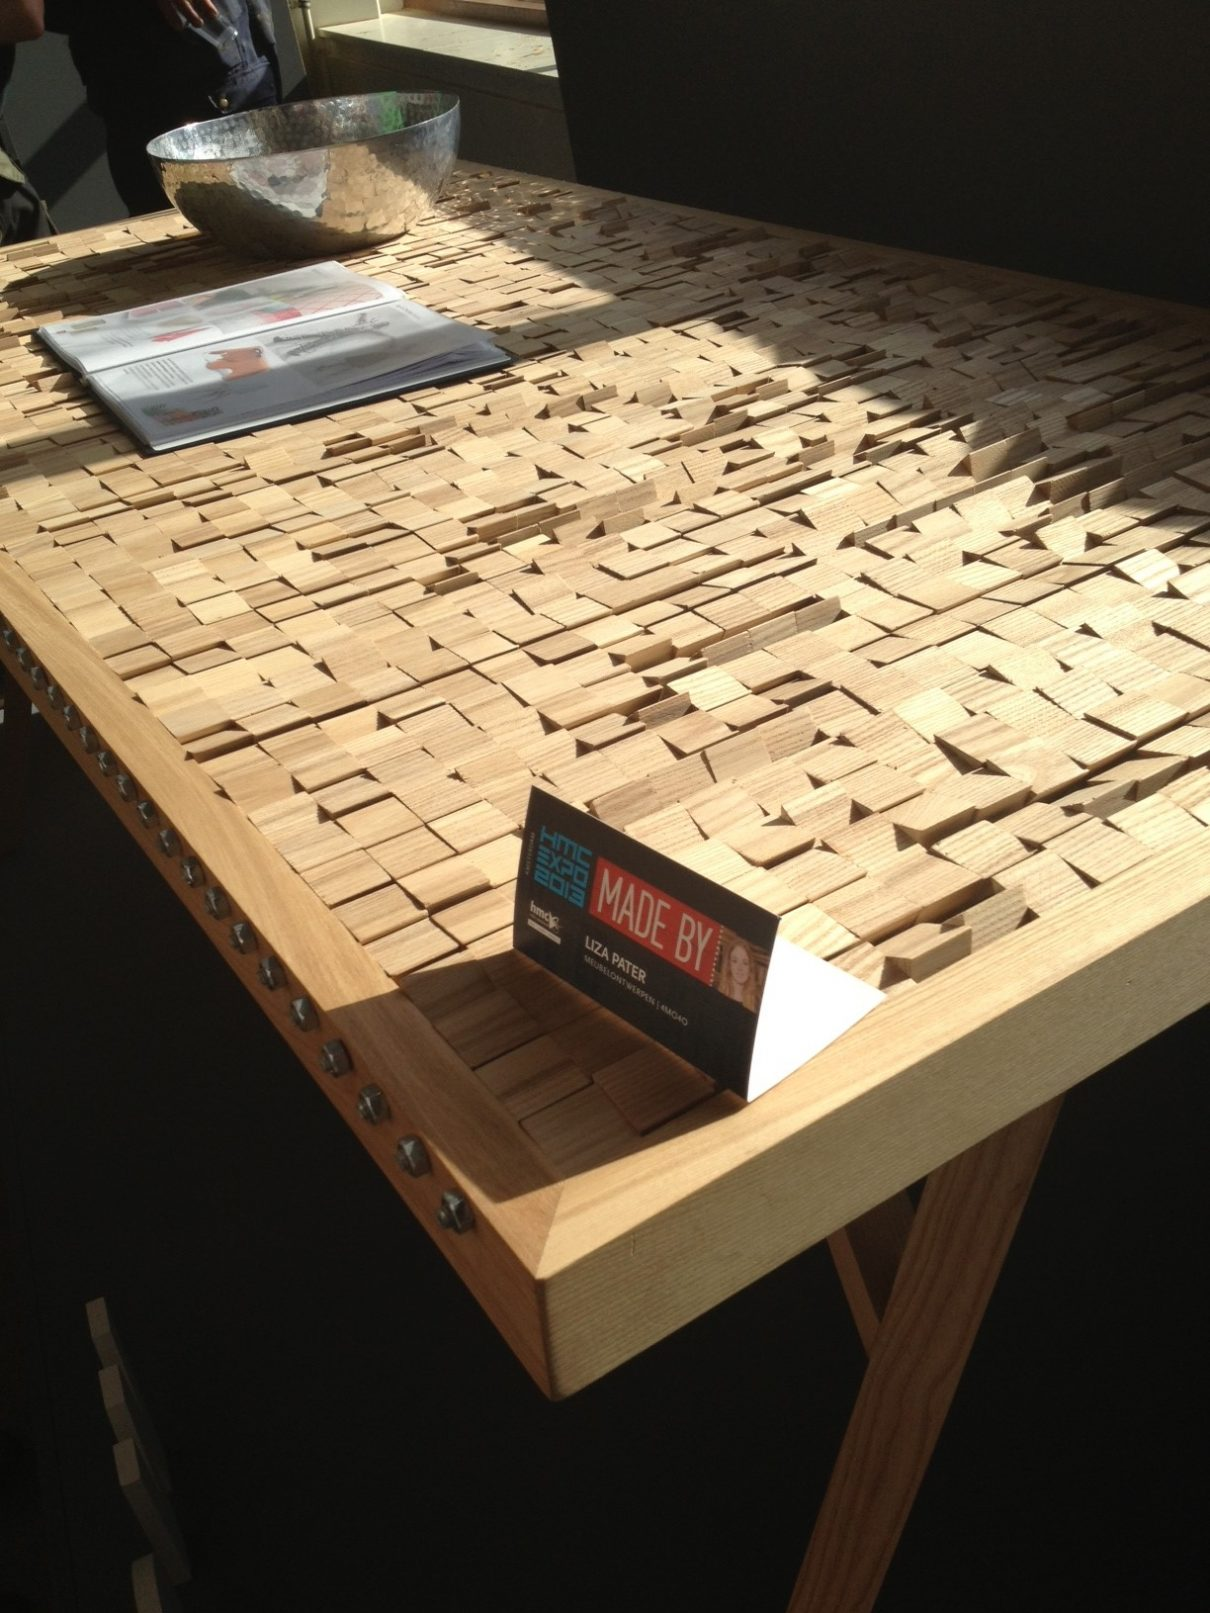 HMC expositie 2013